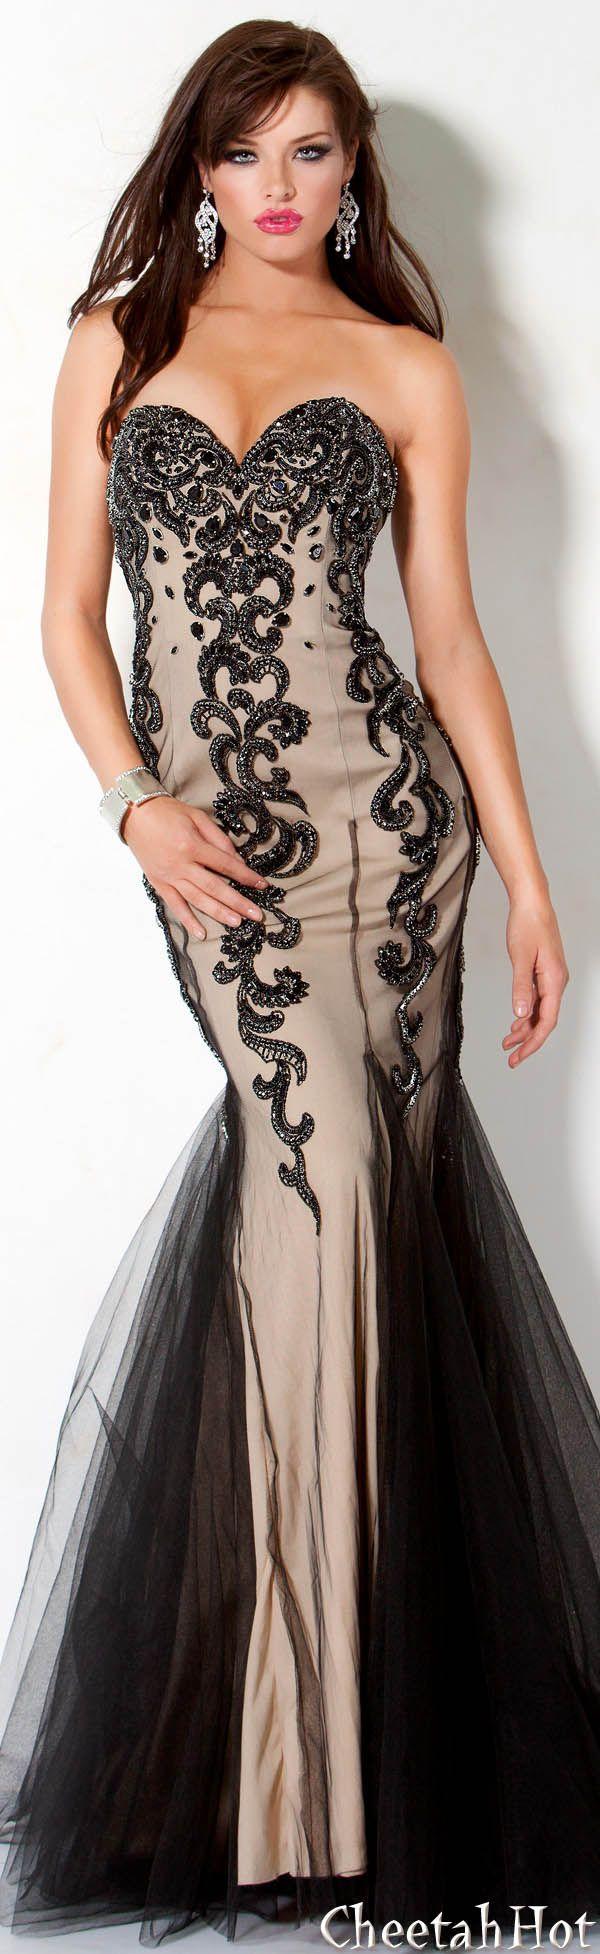 Jovani authentic designer dress pretty strapless gown black